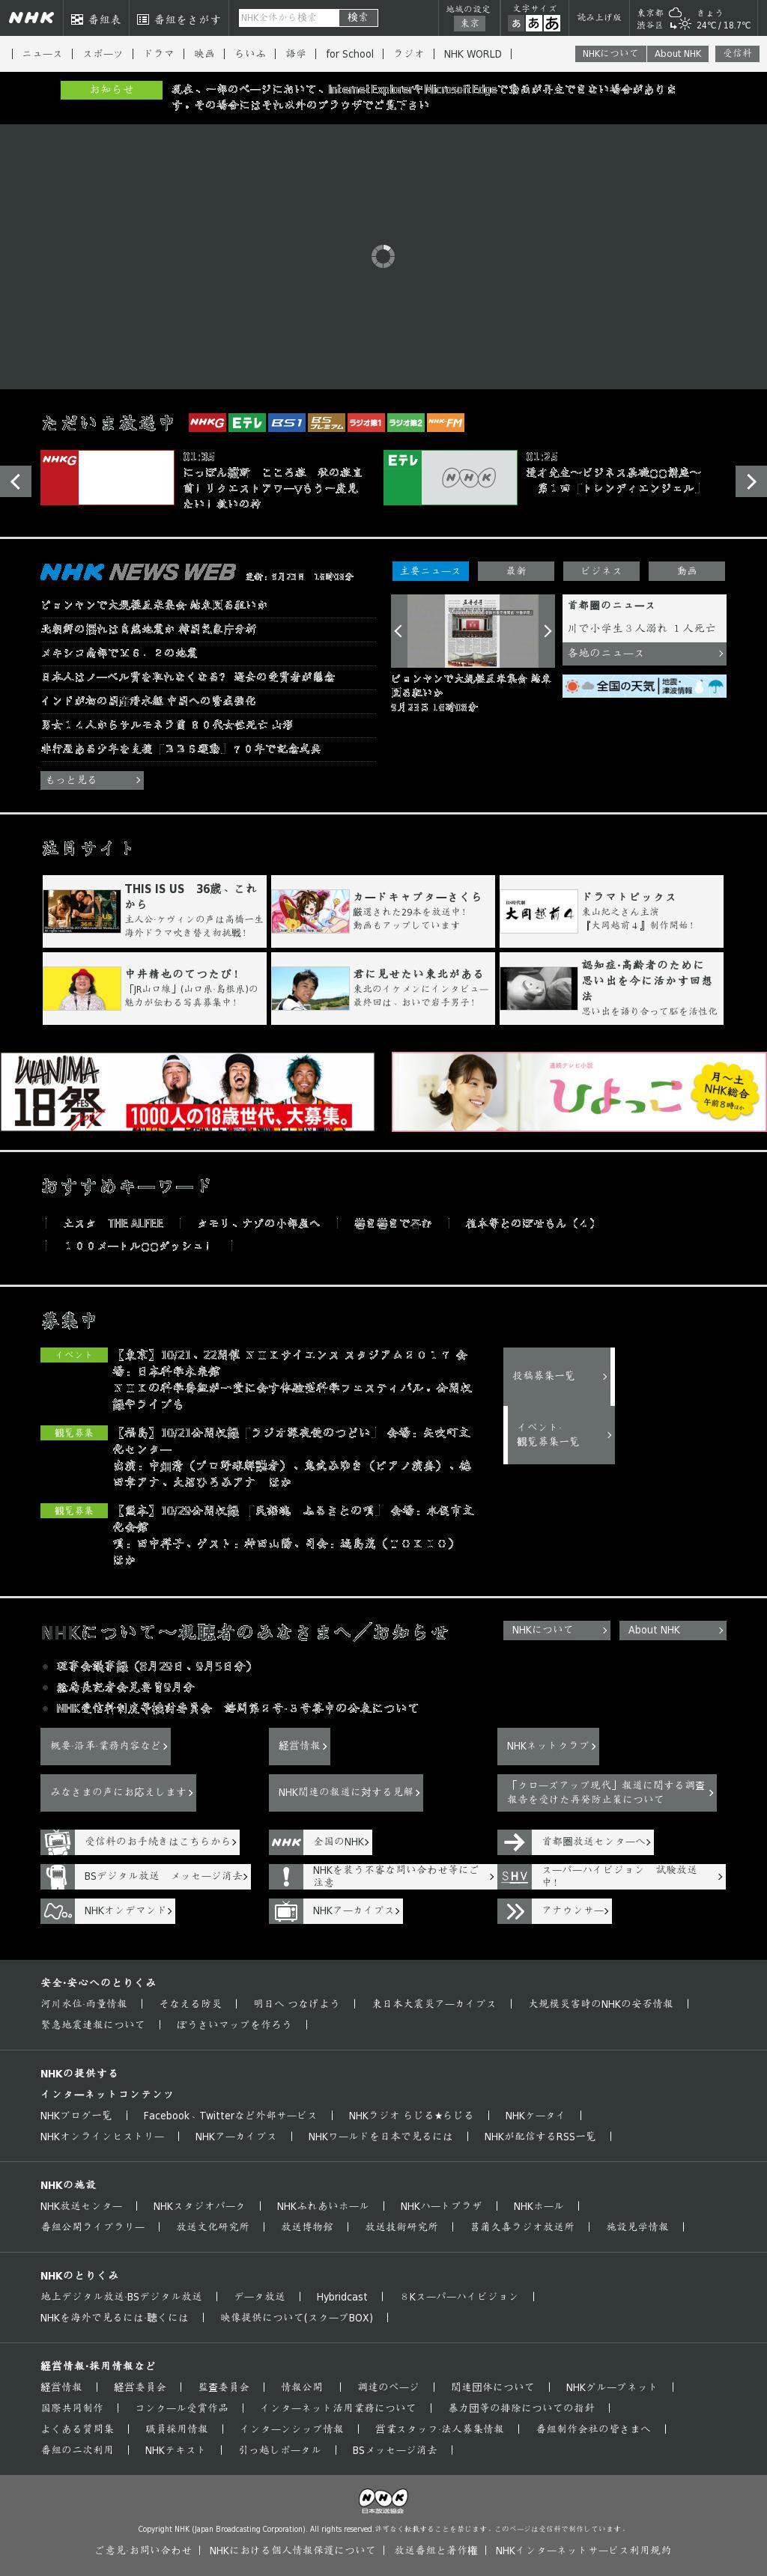 NHK Online at Saturday Sept. 23, 2017, 4:48 p.m. UTC